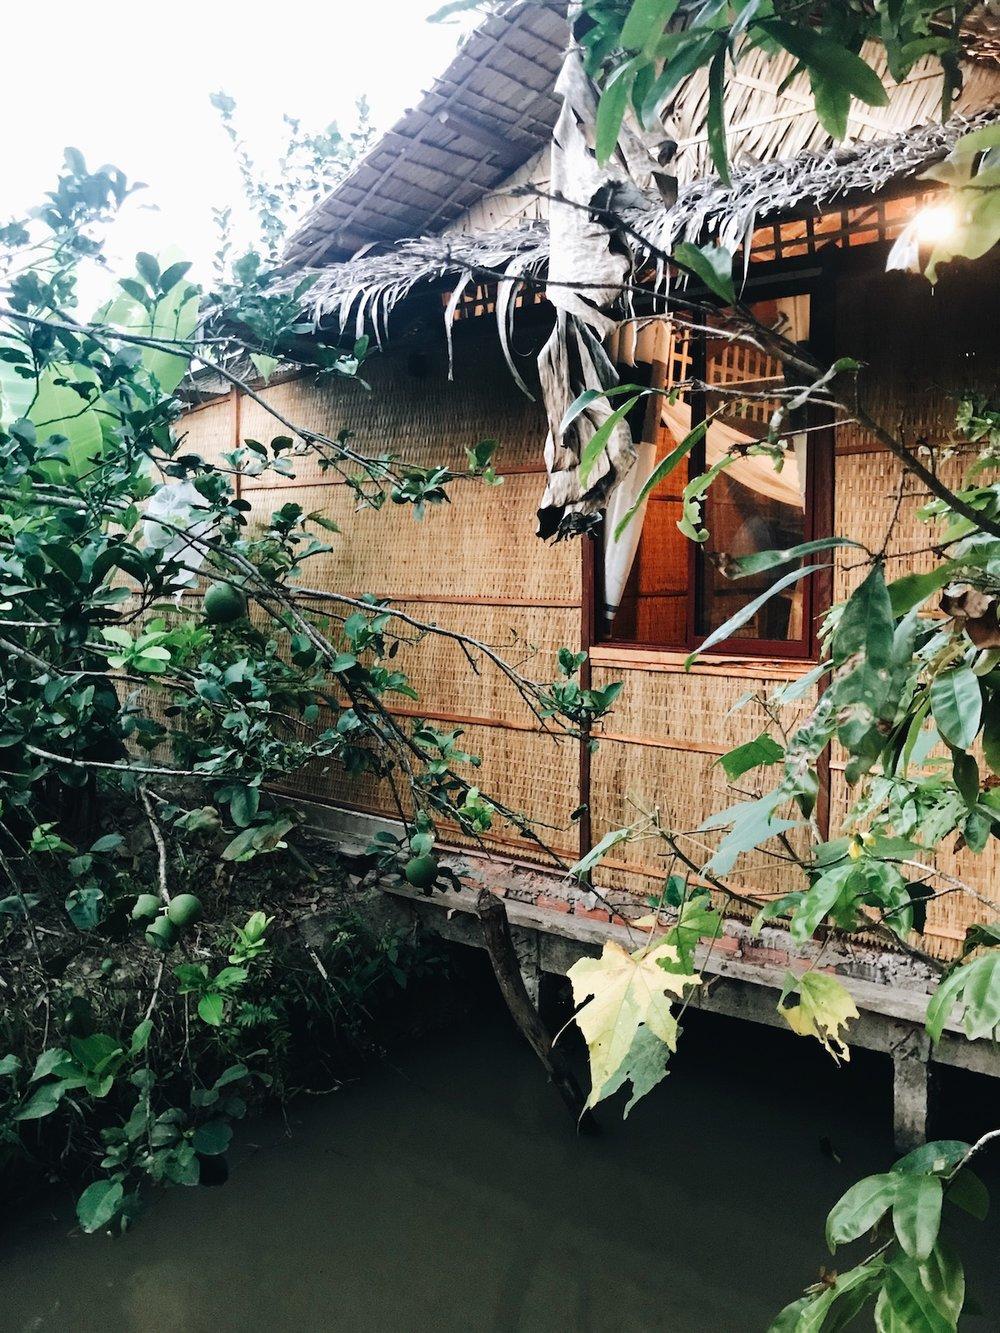 Mekong Delta Homestay, Vietnam Travel Diary | Ruby Josephine